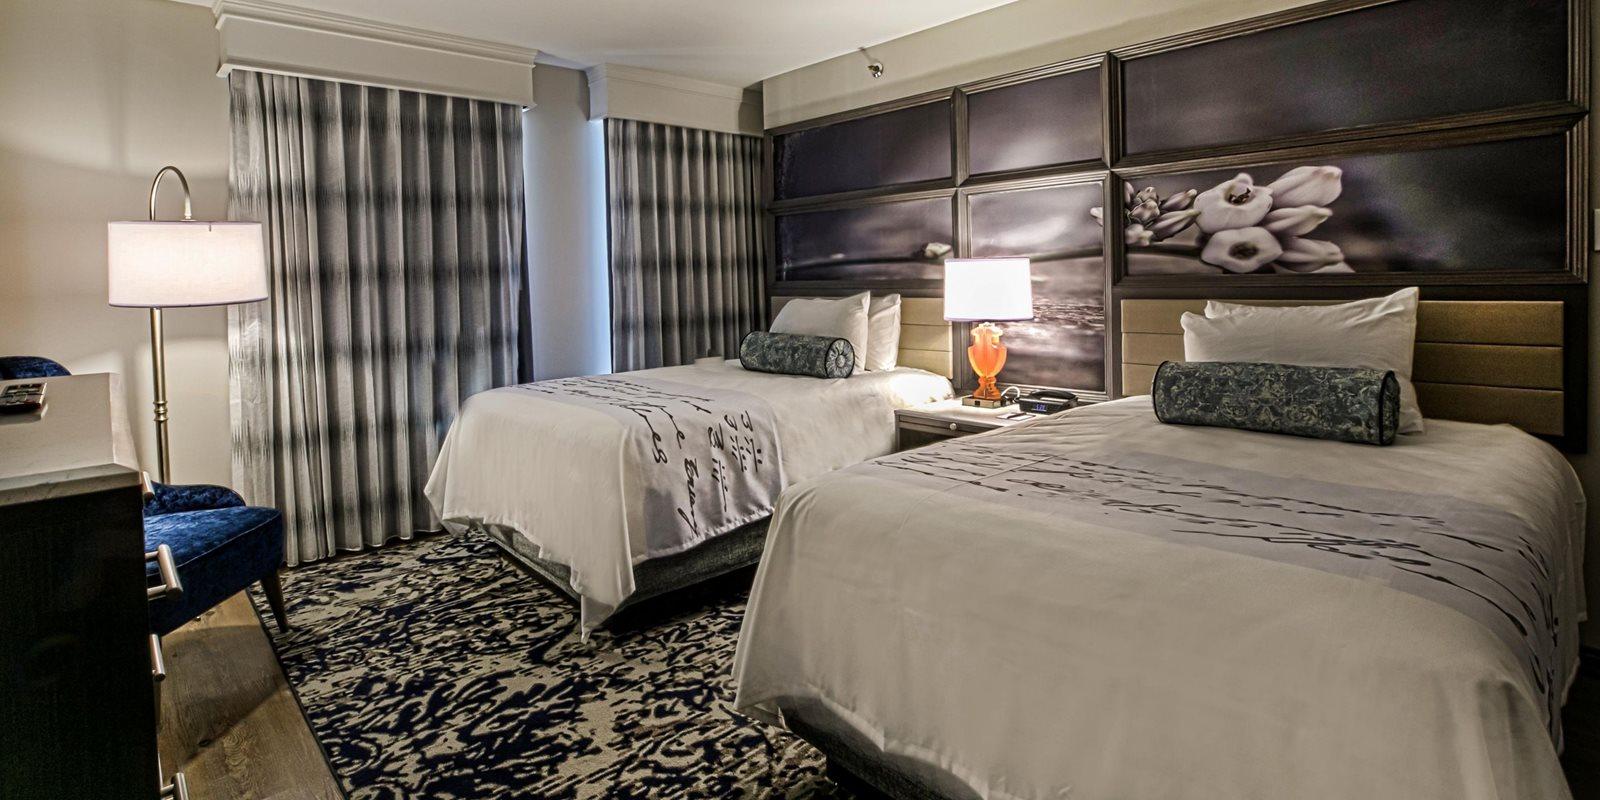 Hotel-Indigo-Birmingham-AL-guest-room-double-front-view.jpg